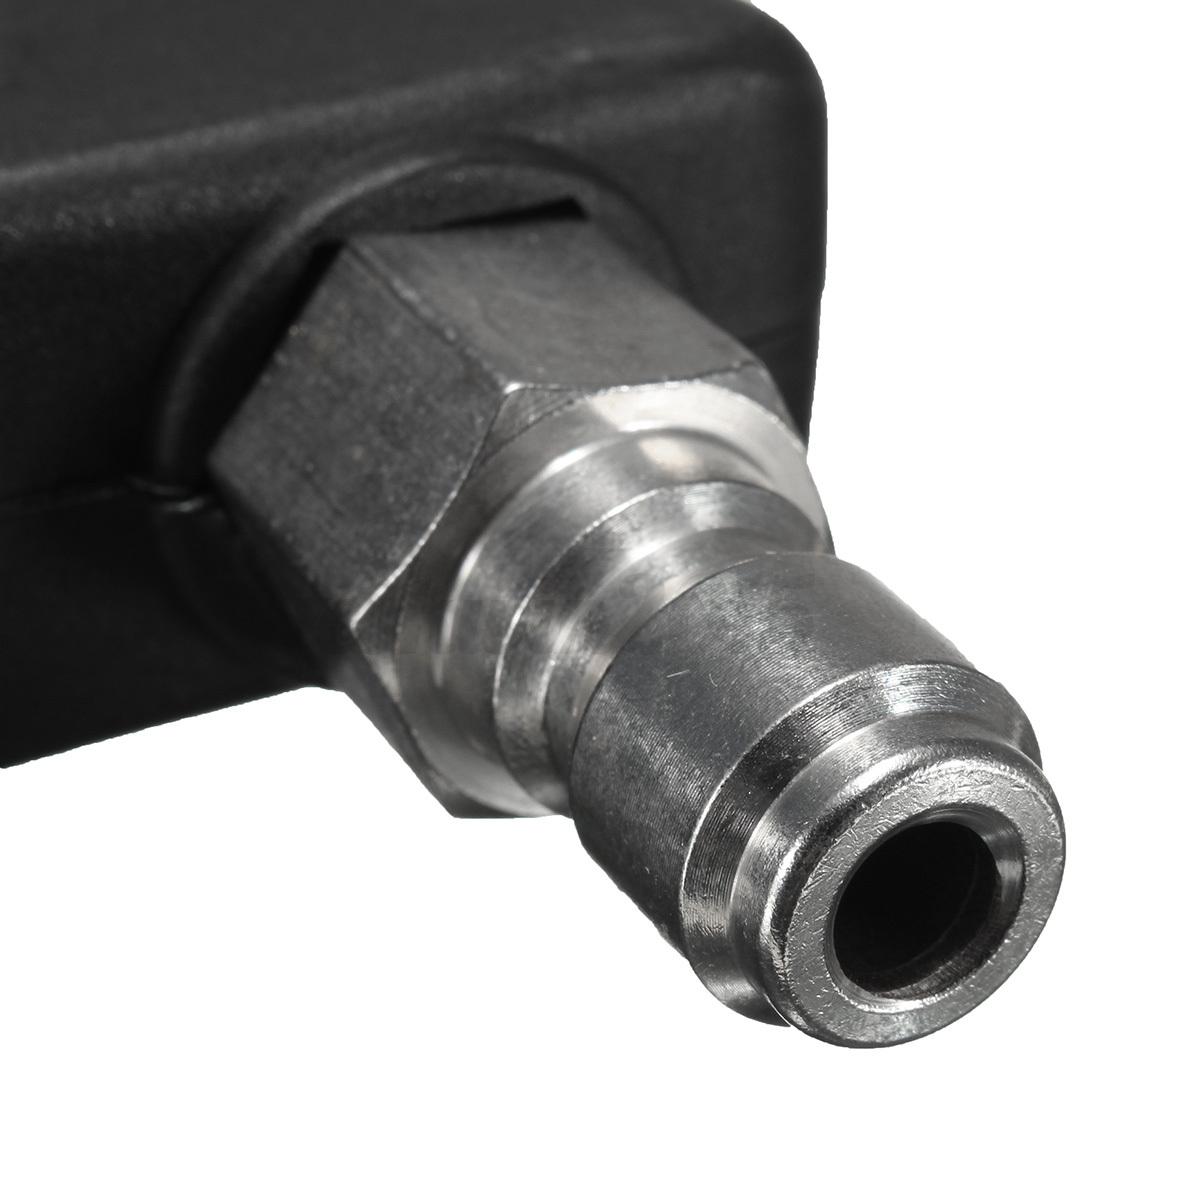 Psi m high pressure washer jet gun adapter color